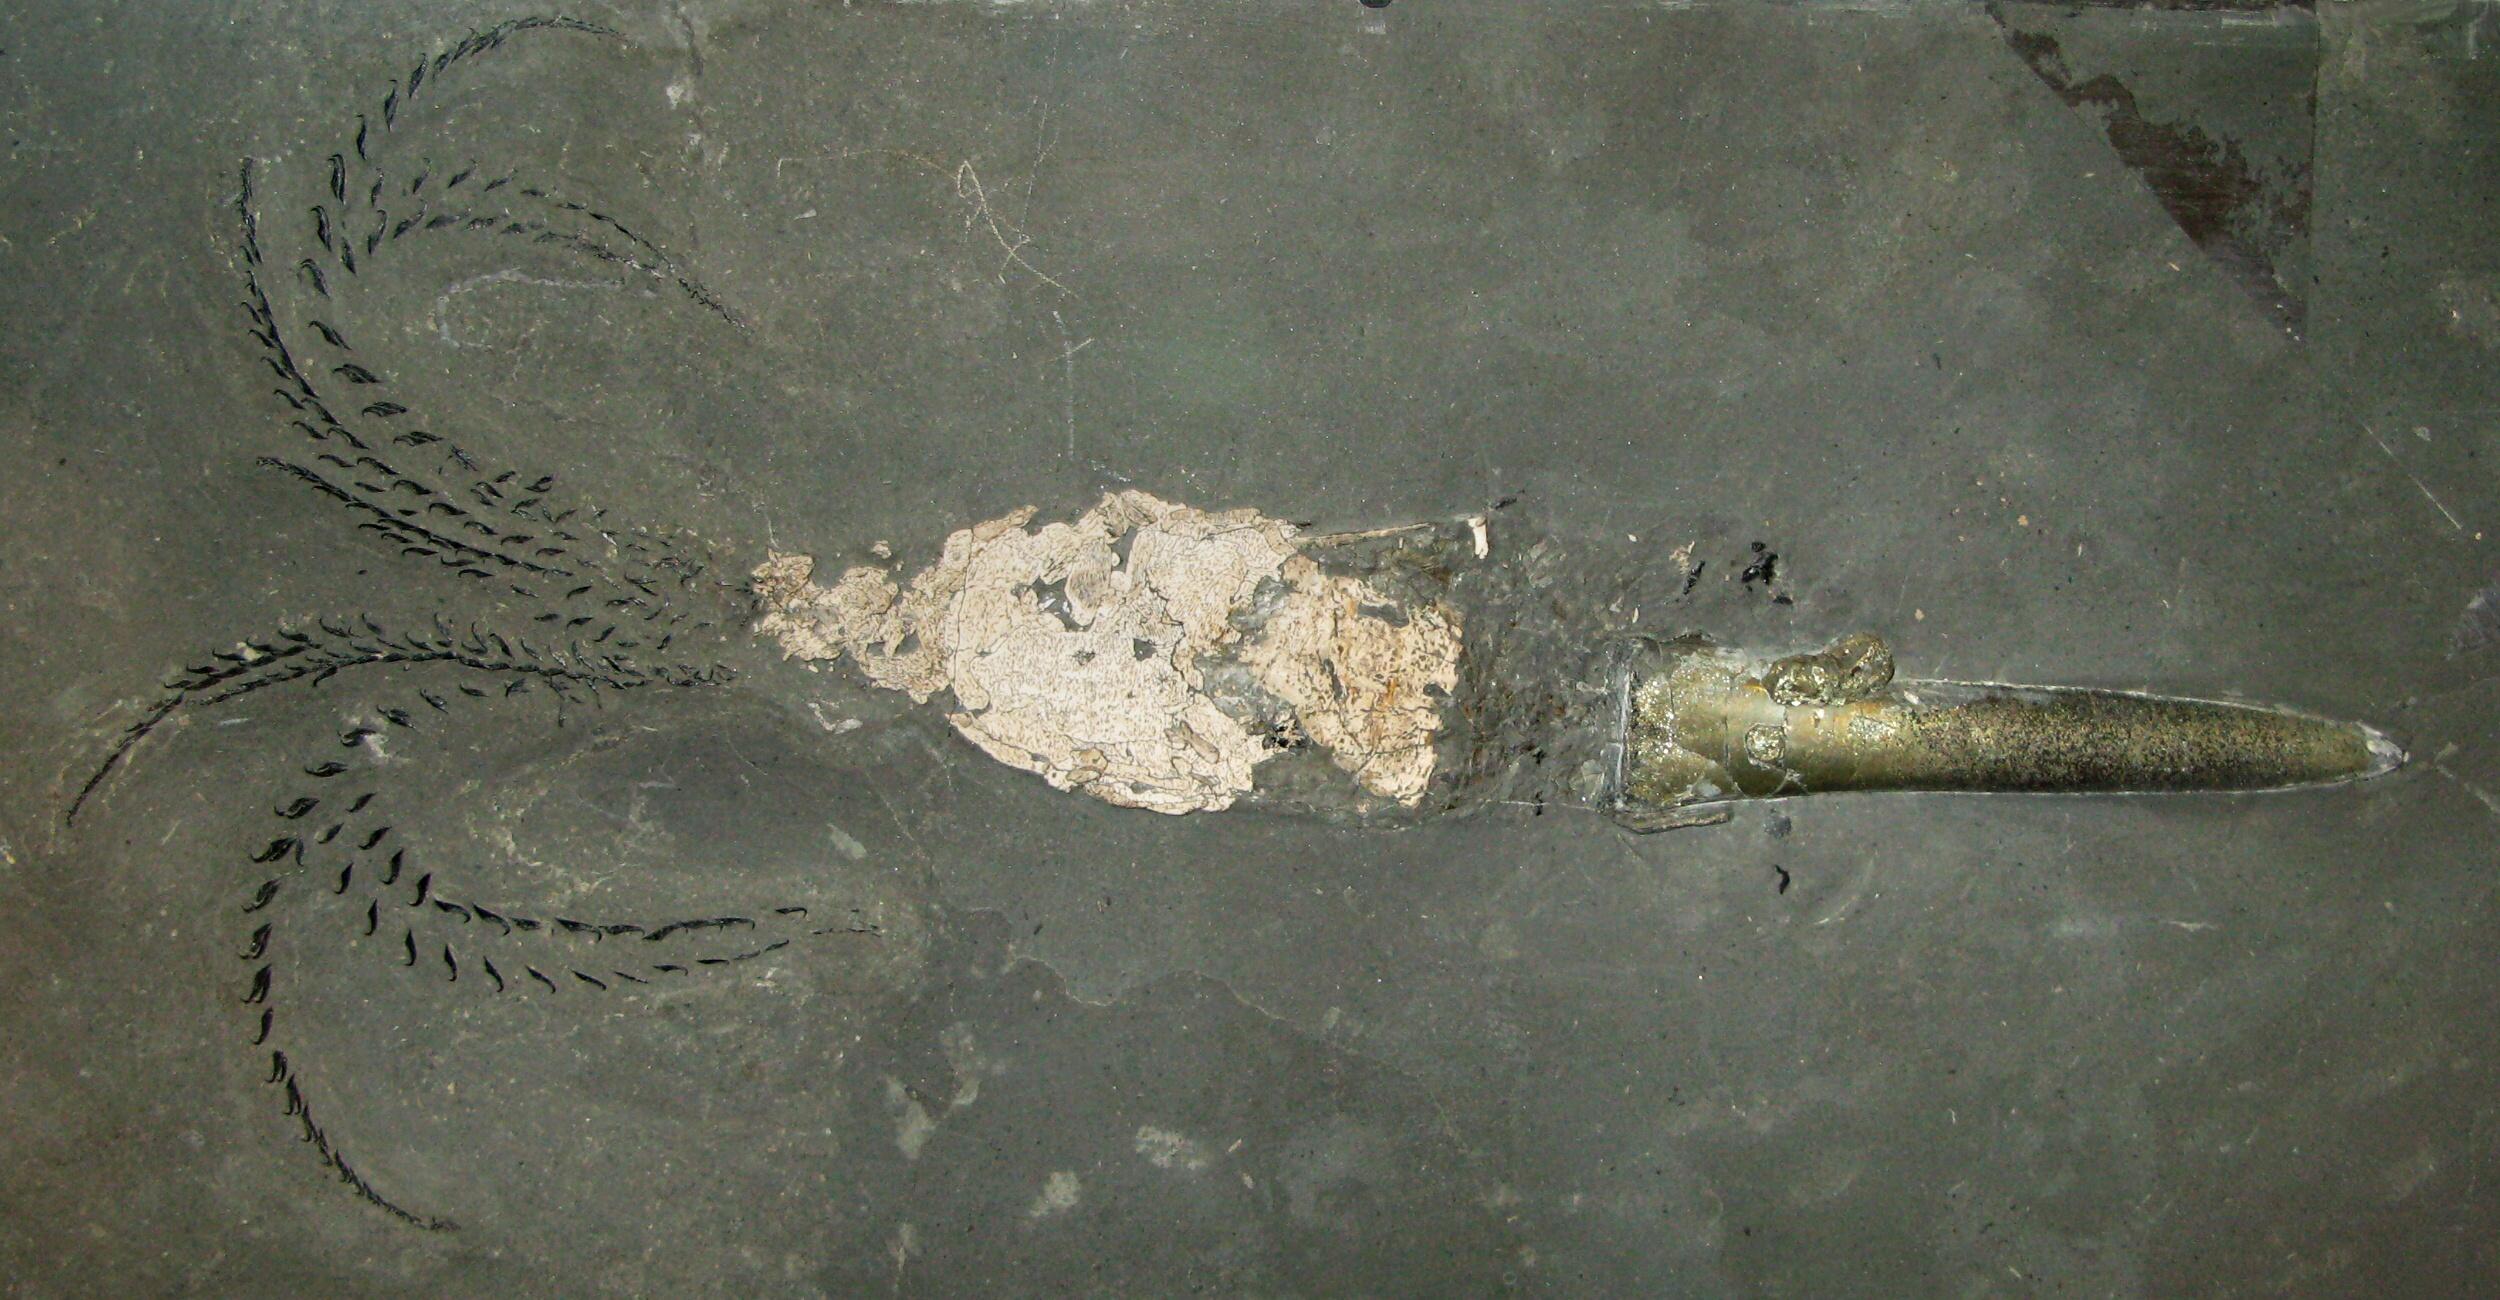 Belemnites Fossil-Belemnoidea-complete